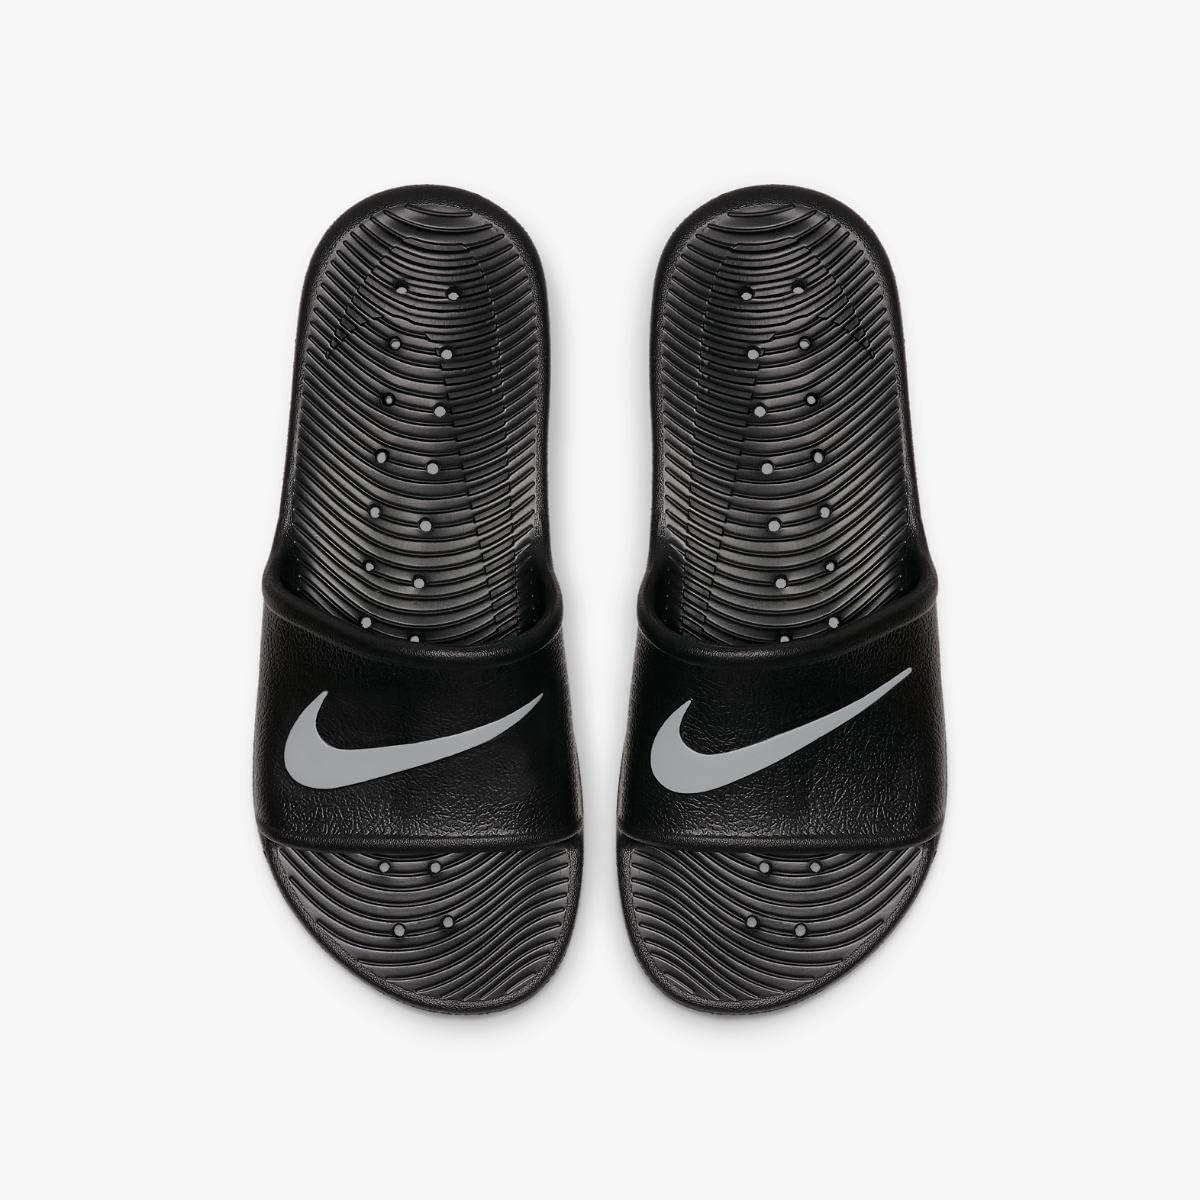 Nike WMNS Kawa Shower Chaussures de Plage & Piscine Femme ...